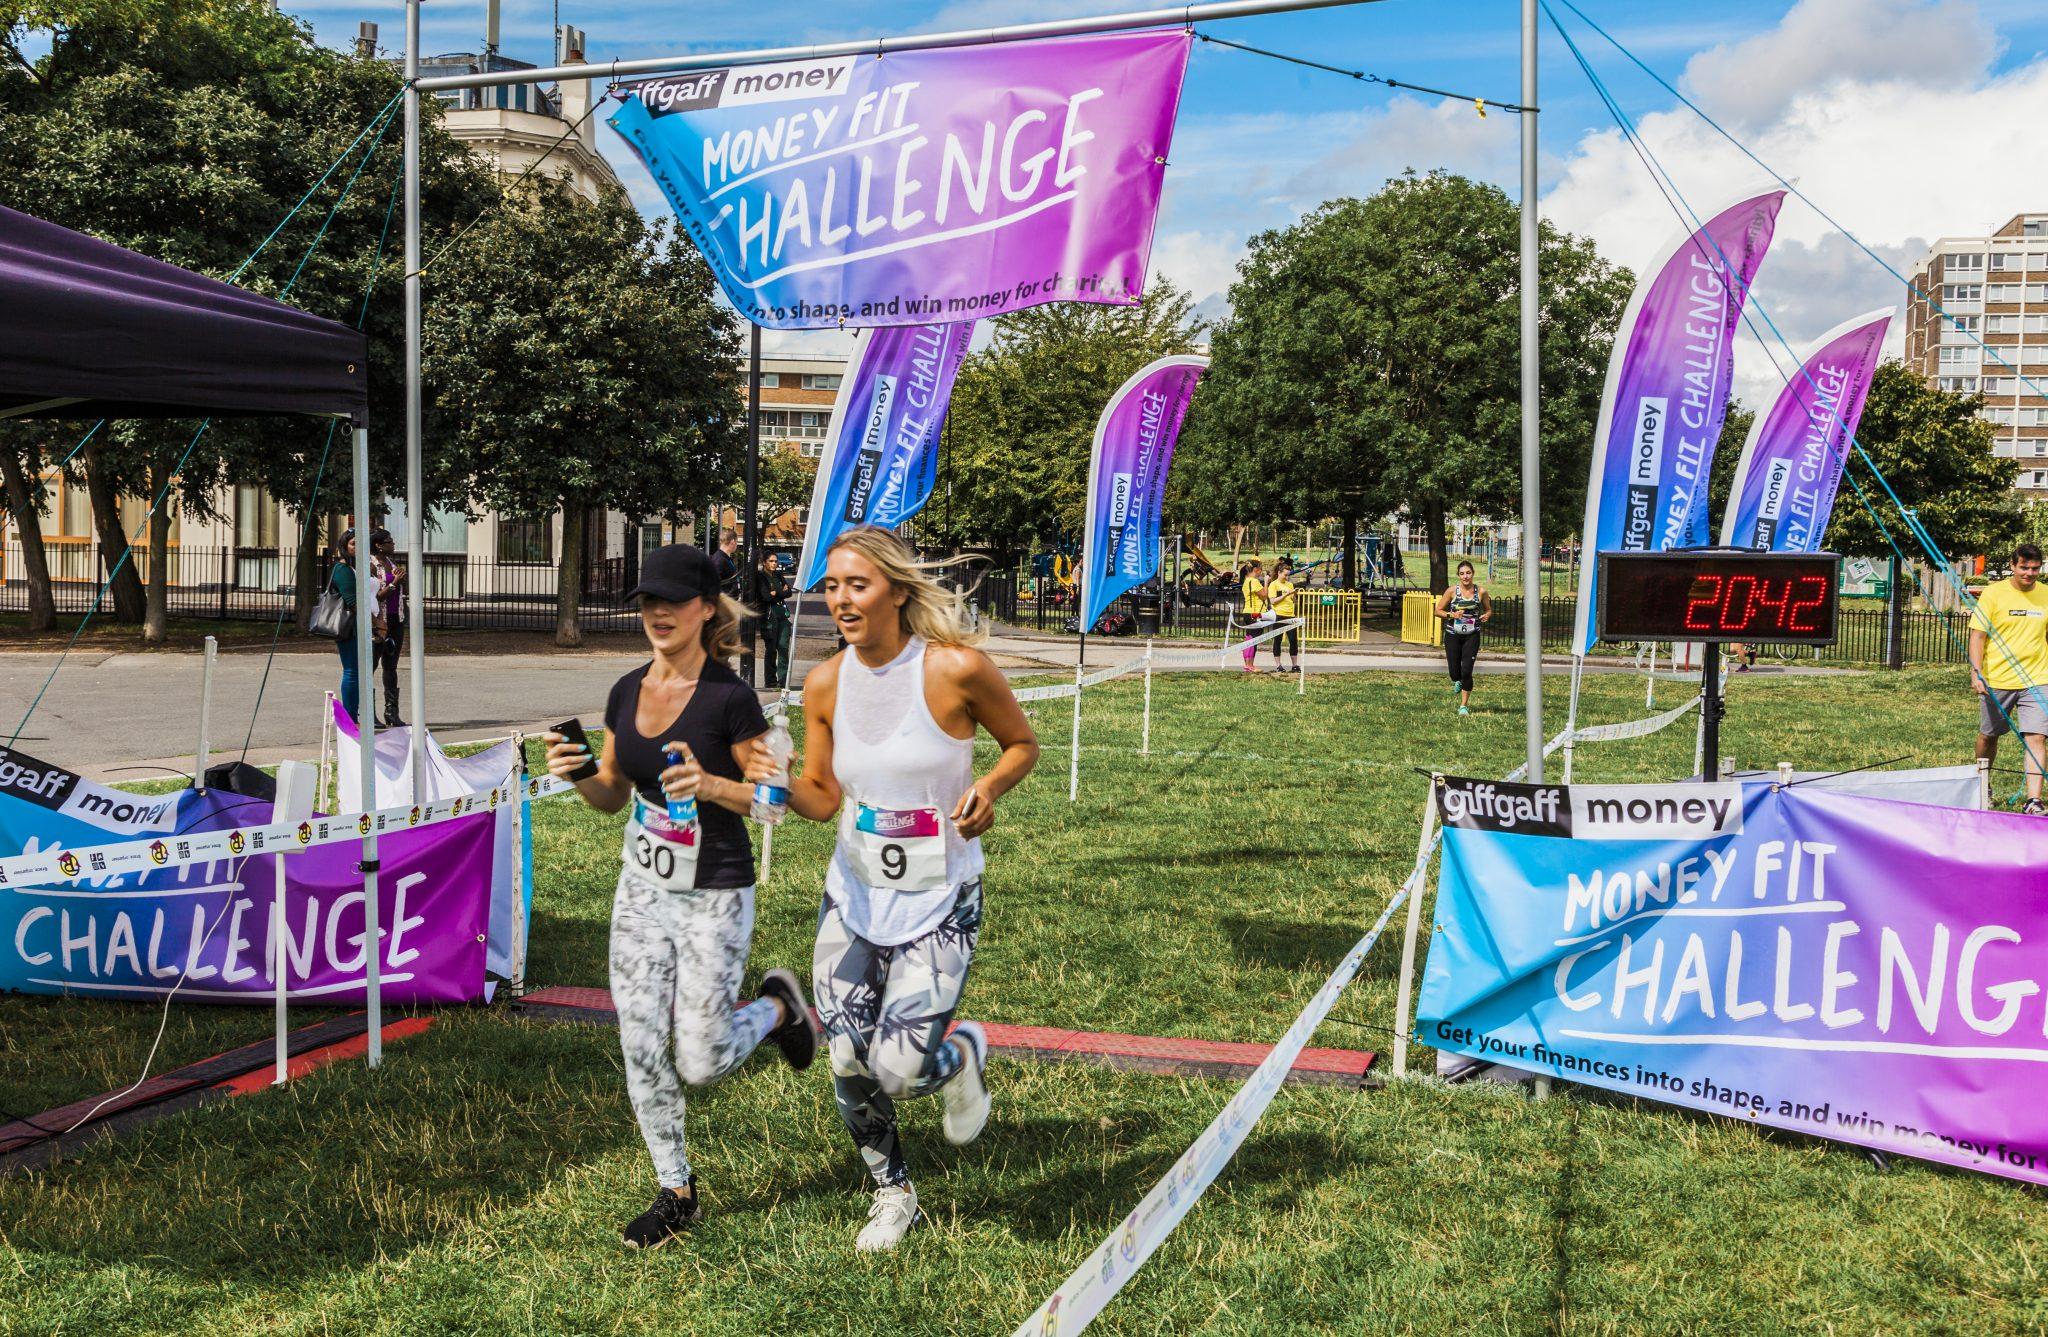 0030 Finish Line - Giff Gaff Money Fit Challenge